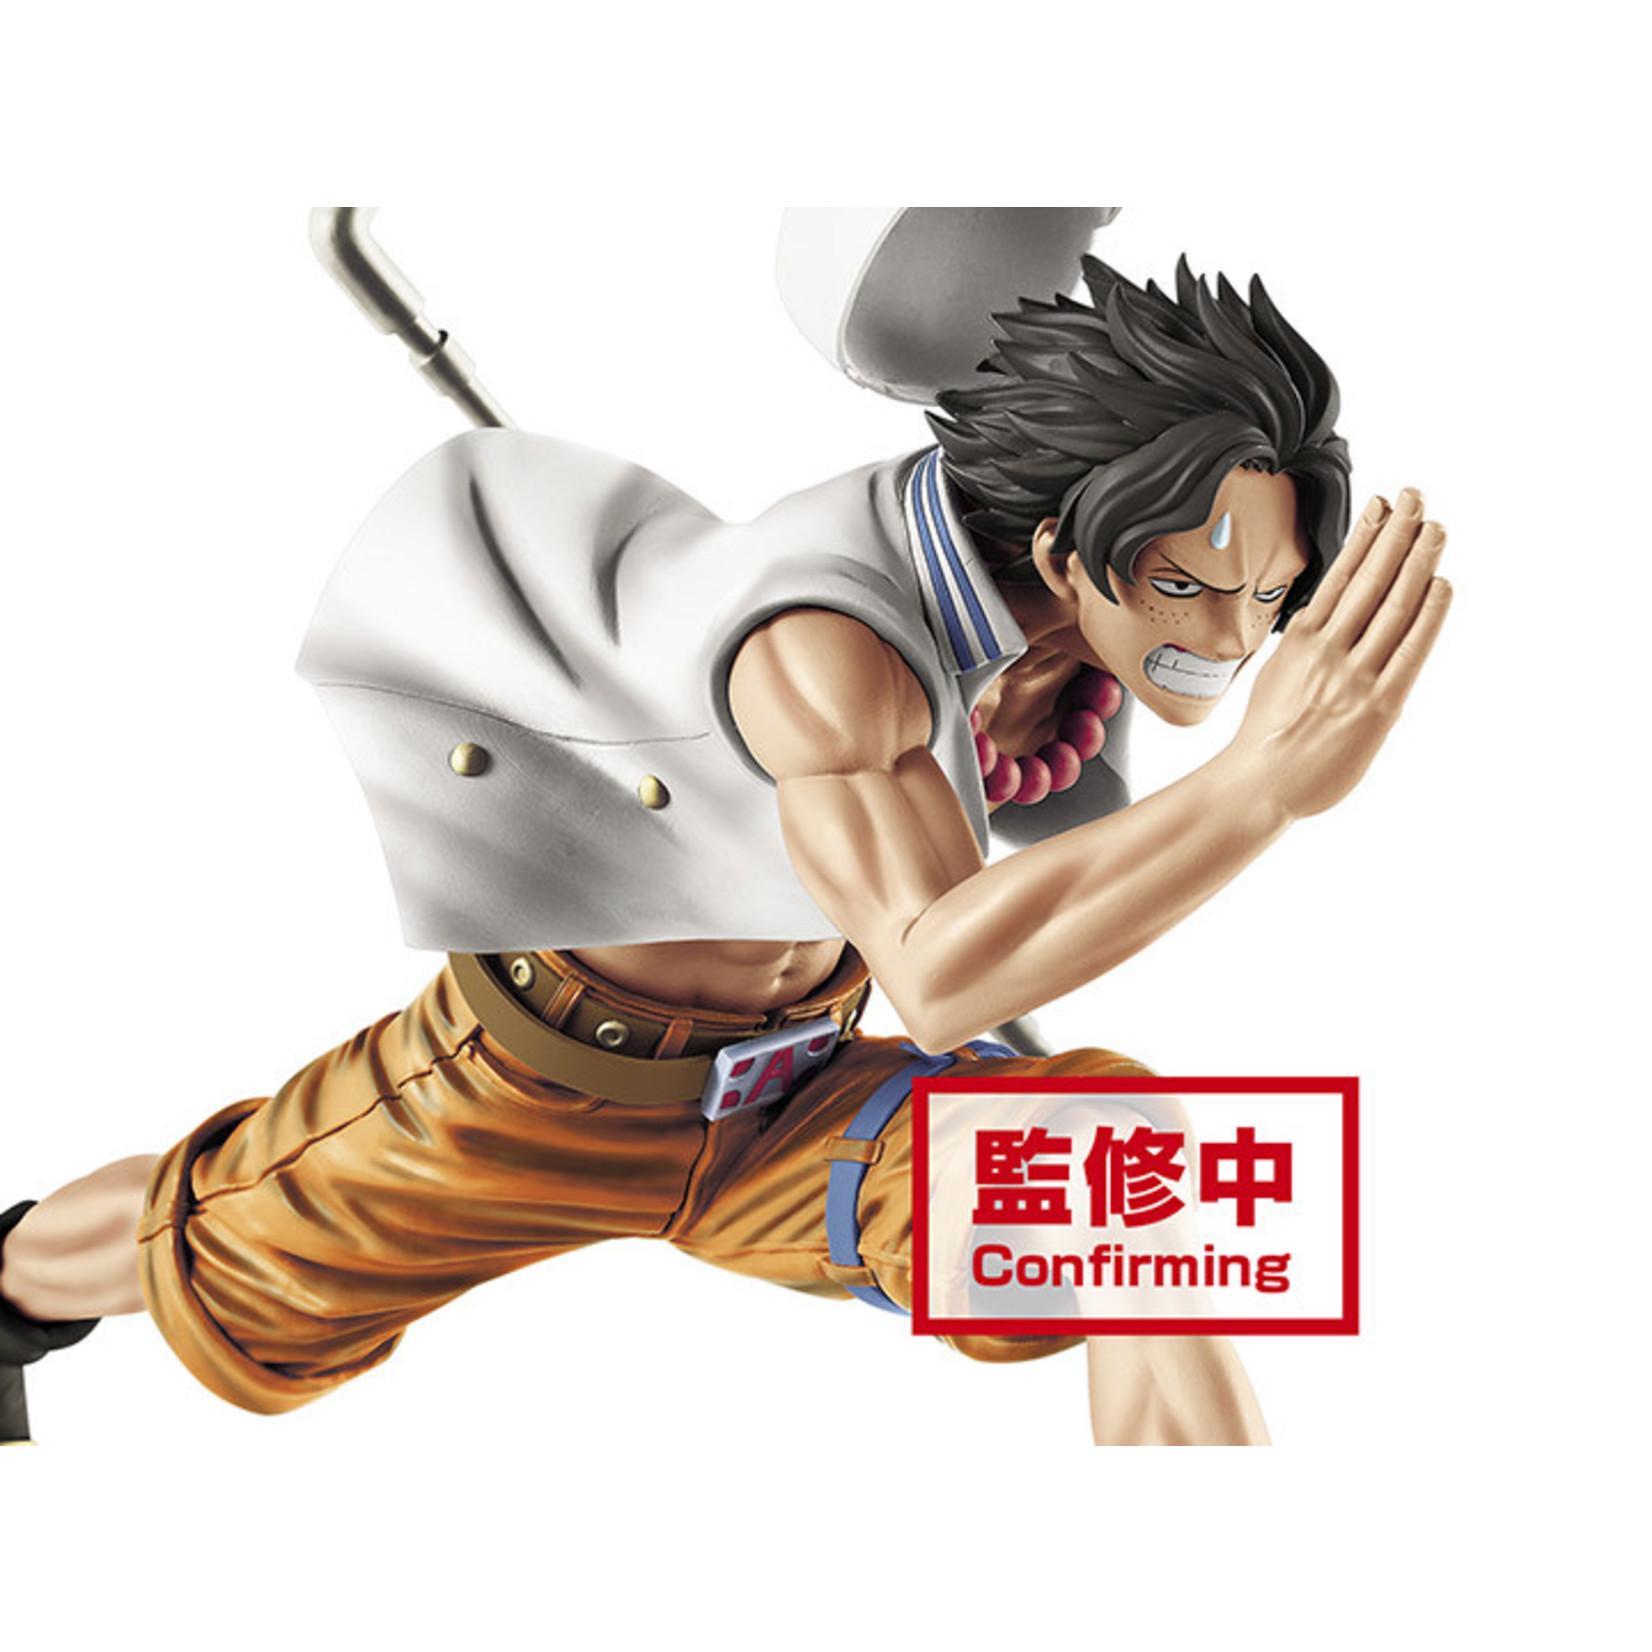 Figure-One Piece Magazine Figure - A Piece of Dream #1 - Special (CPortgas.D.Ace)